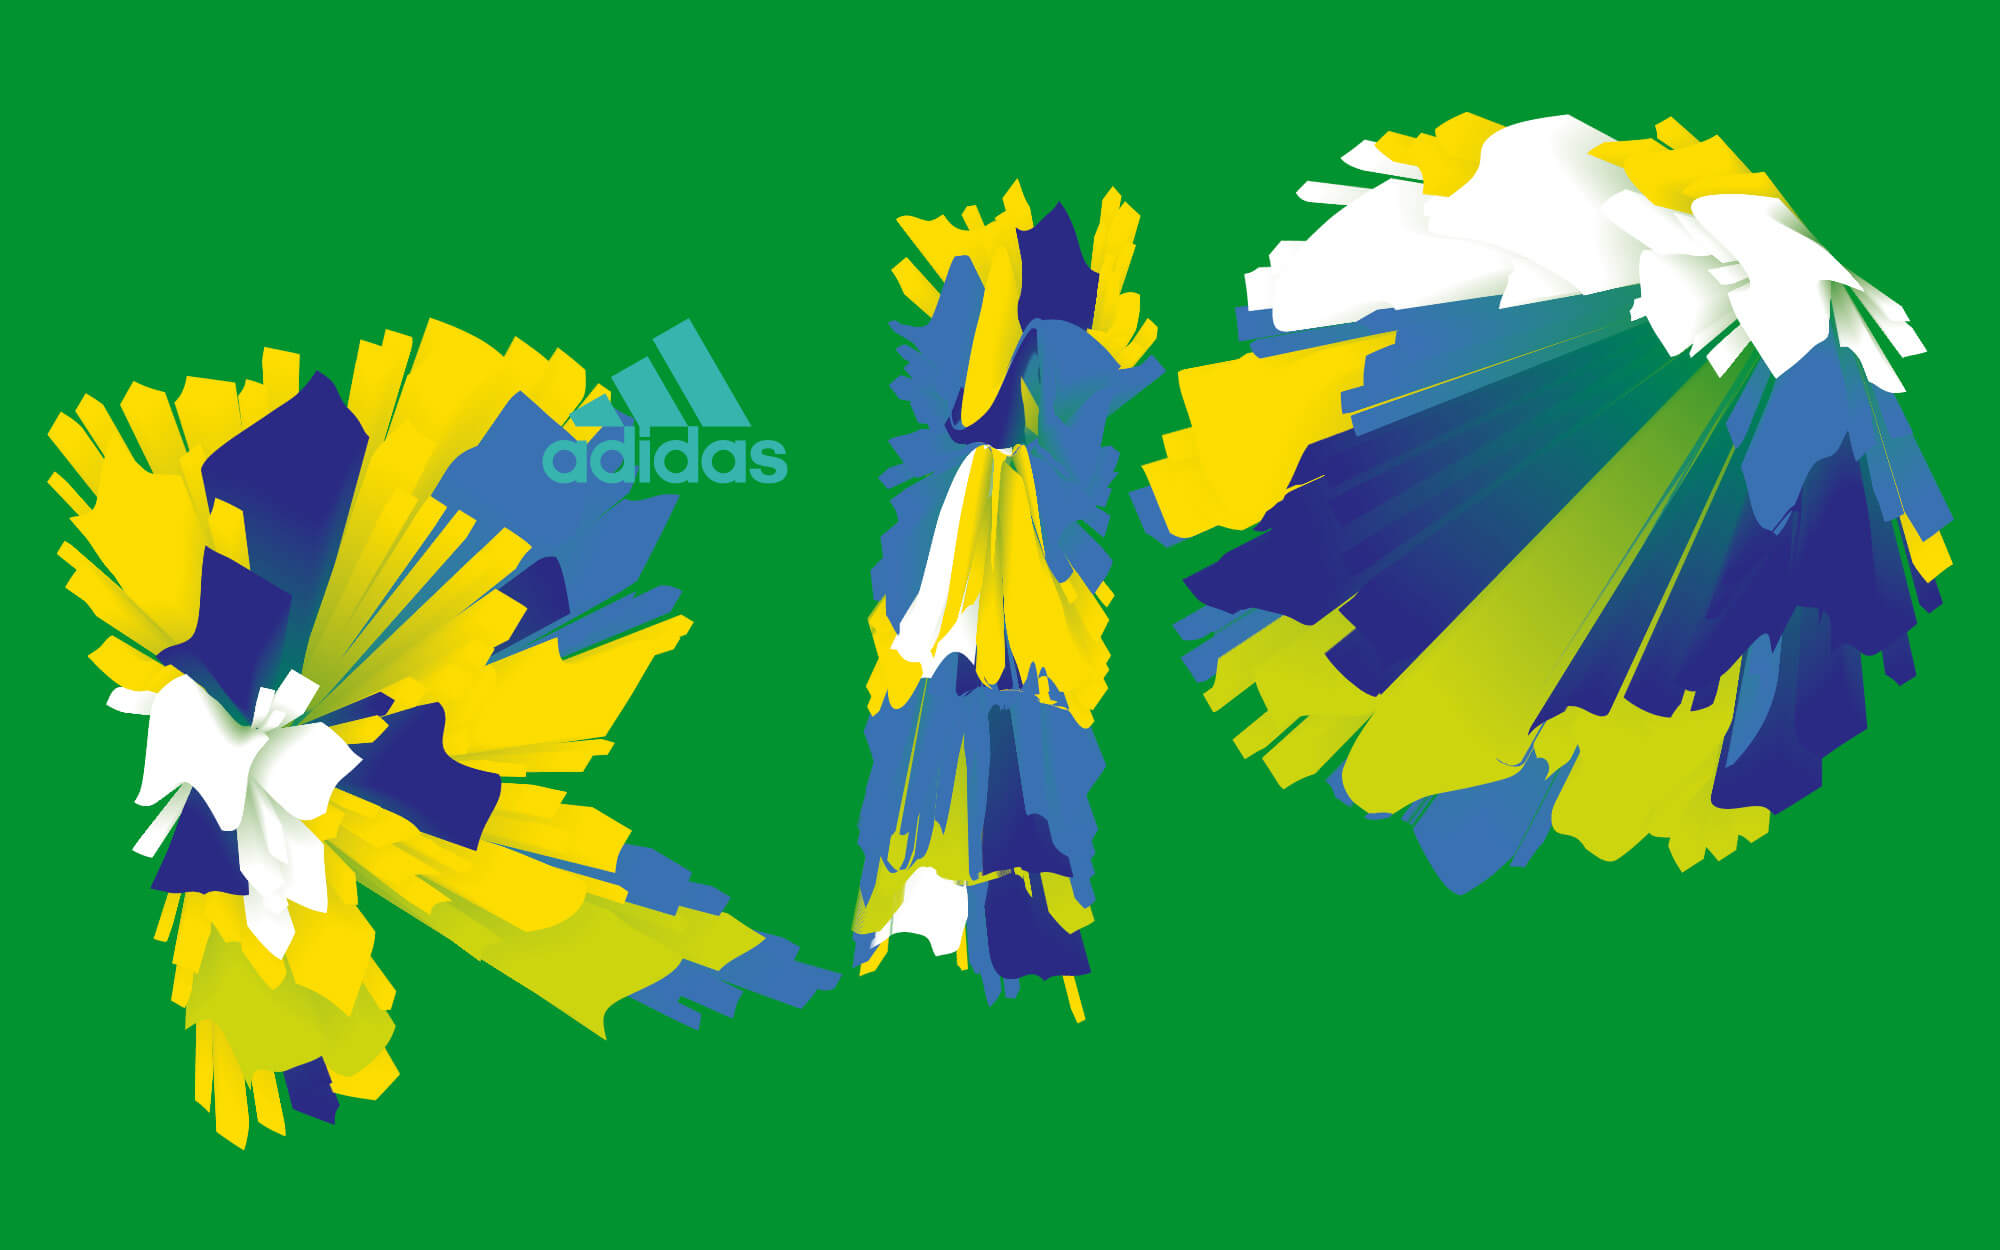 EIGA_adidas_TypeExploration_L_18